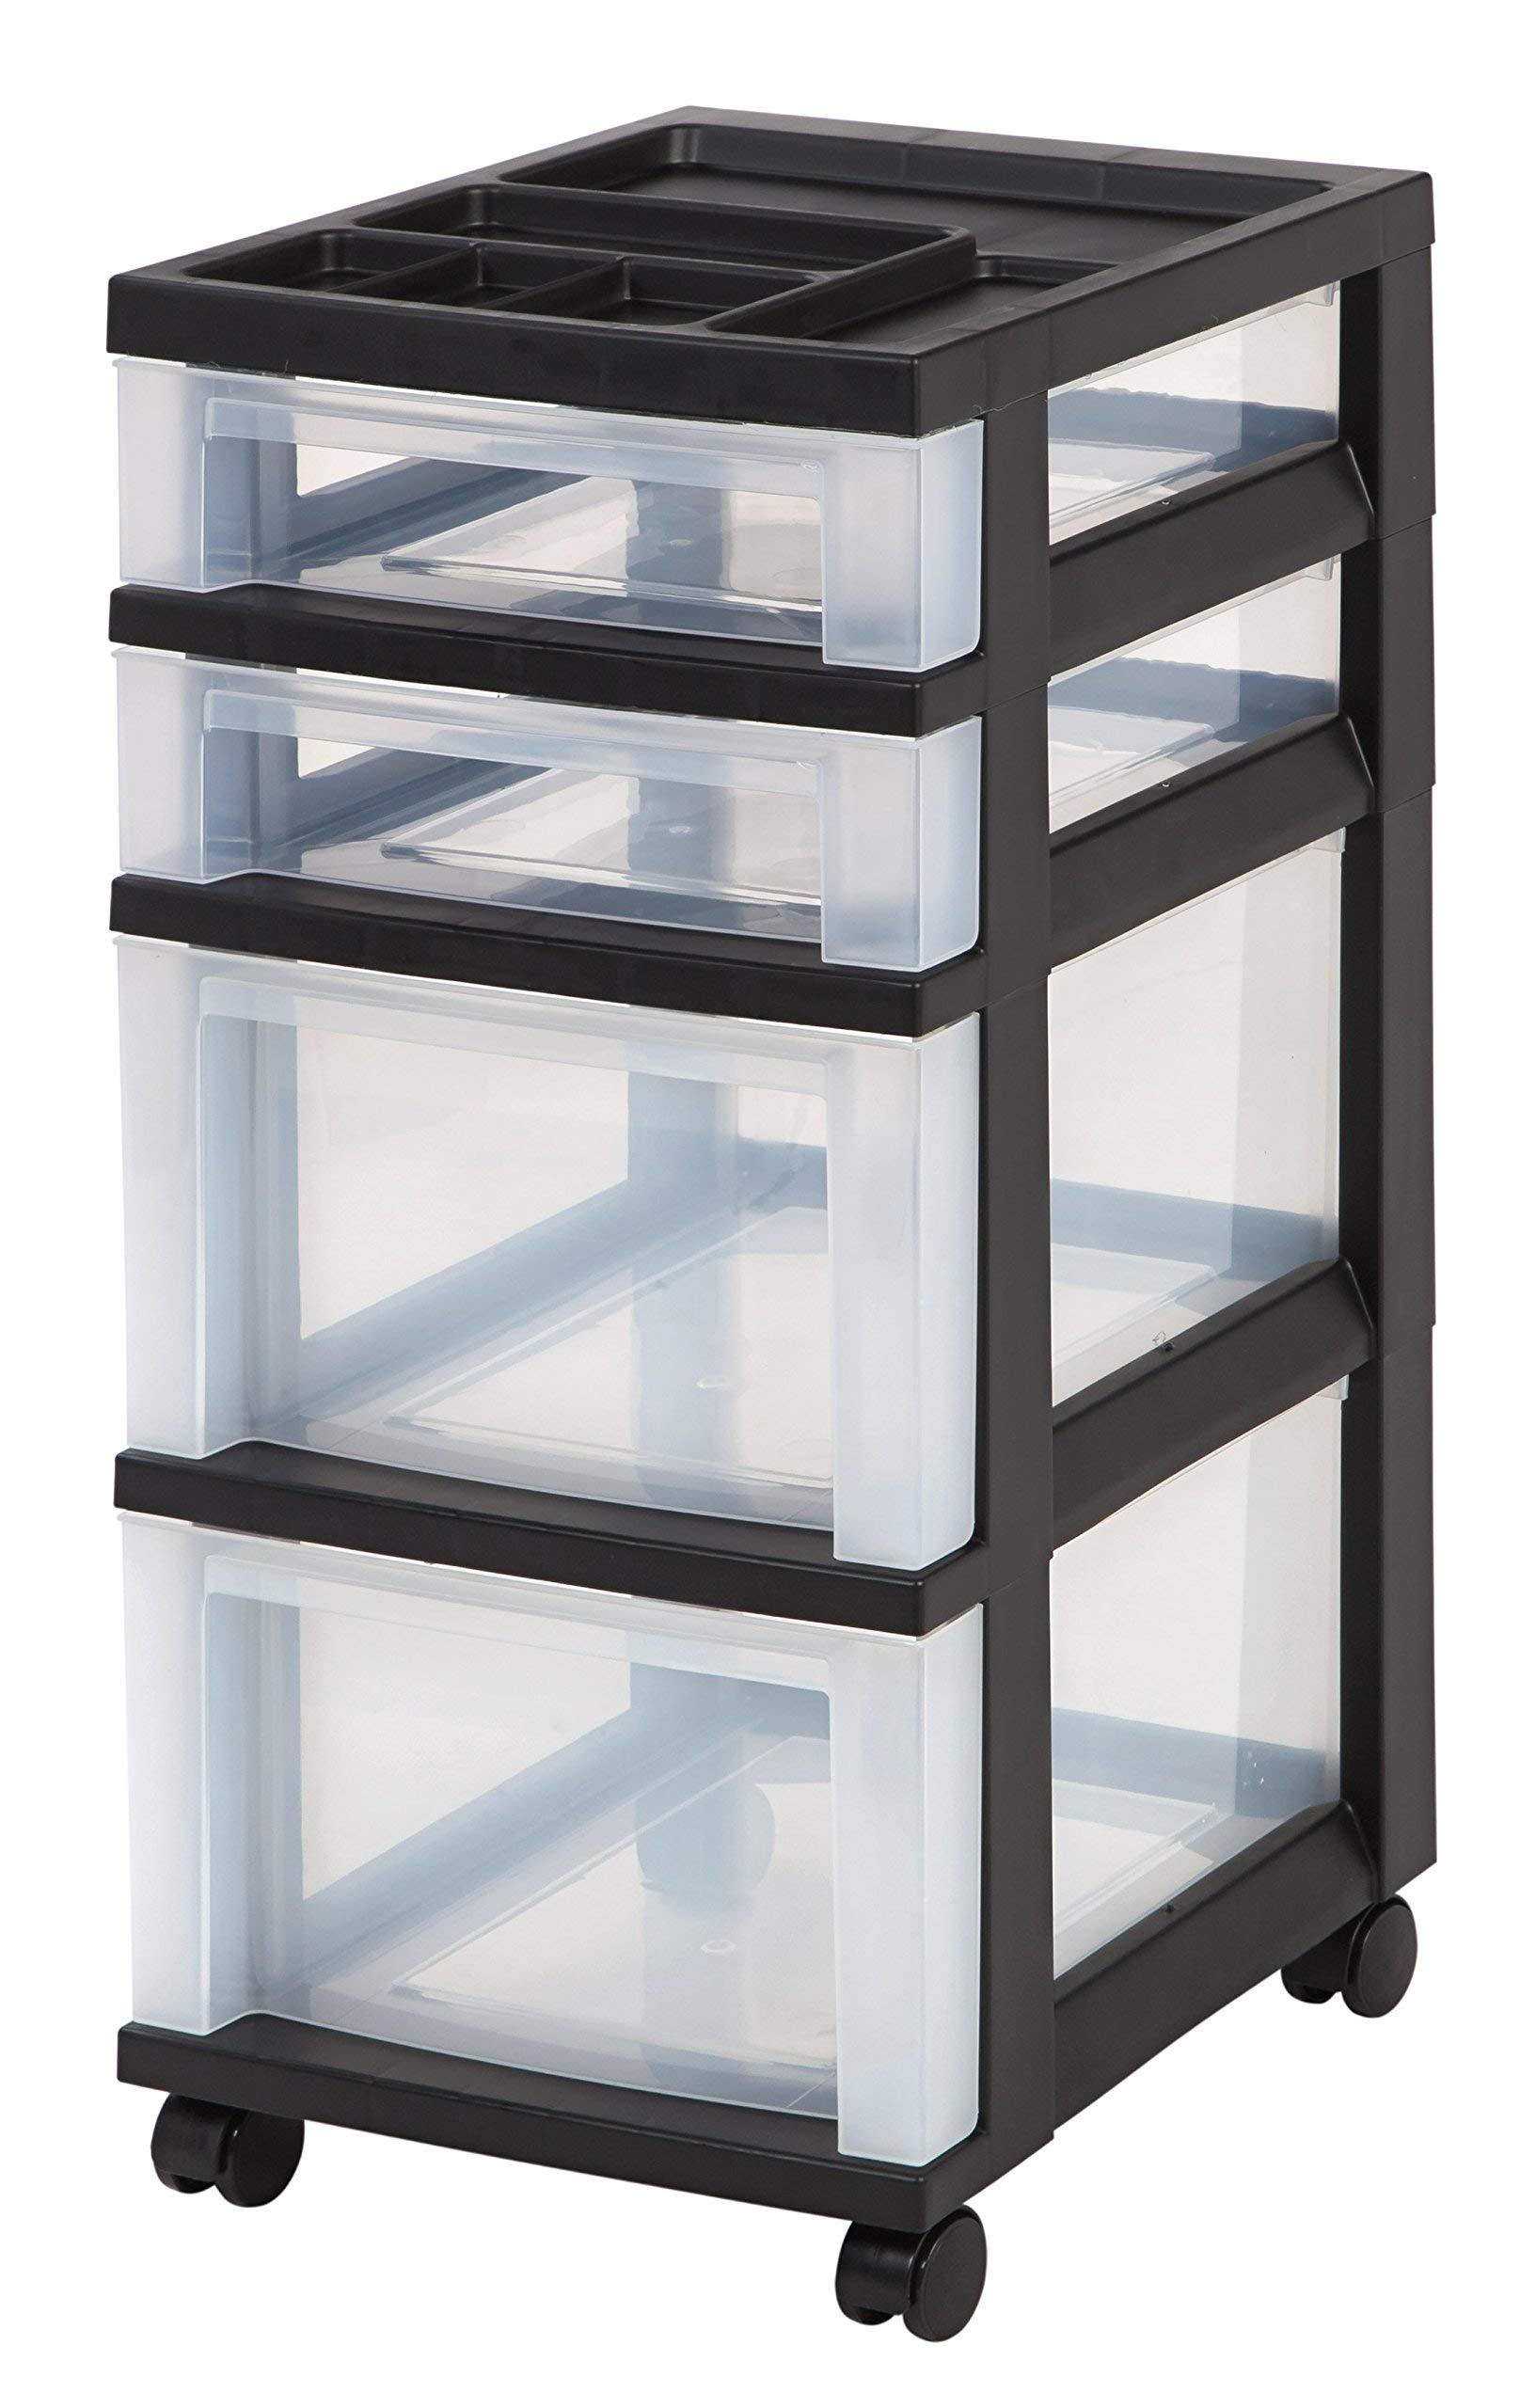 Best Choice 4-Drawer Rolling Storage Cart with Organizer Top, Black